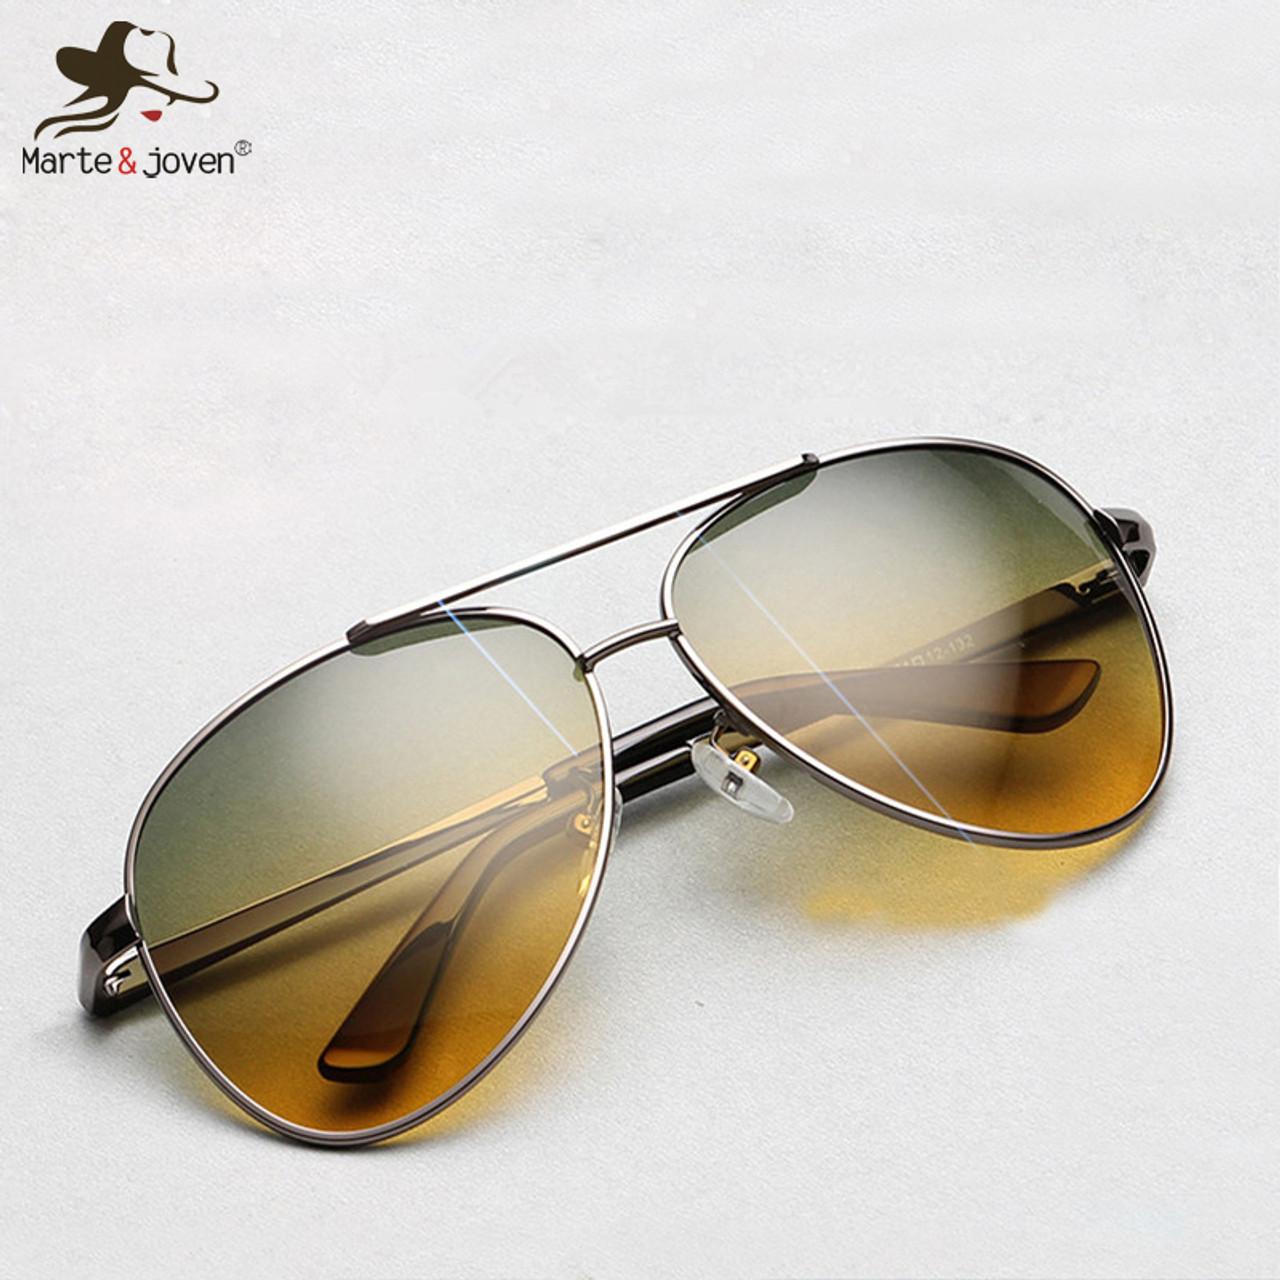 097c3382a87 2018 Top quality Pilot sunglasses Men s night vision driving polarized  sunglasses HD UV400 multifunction sport Glasses ...